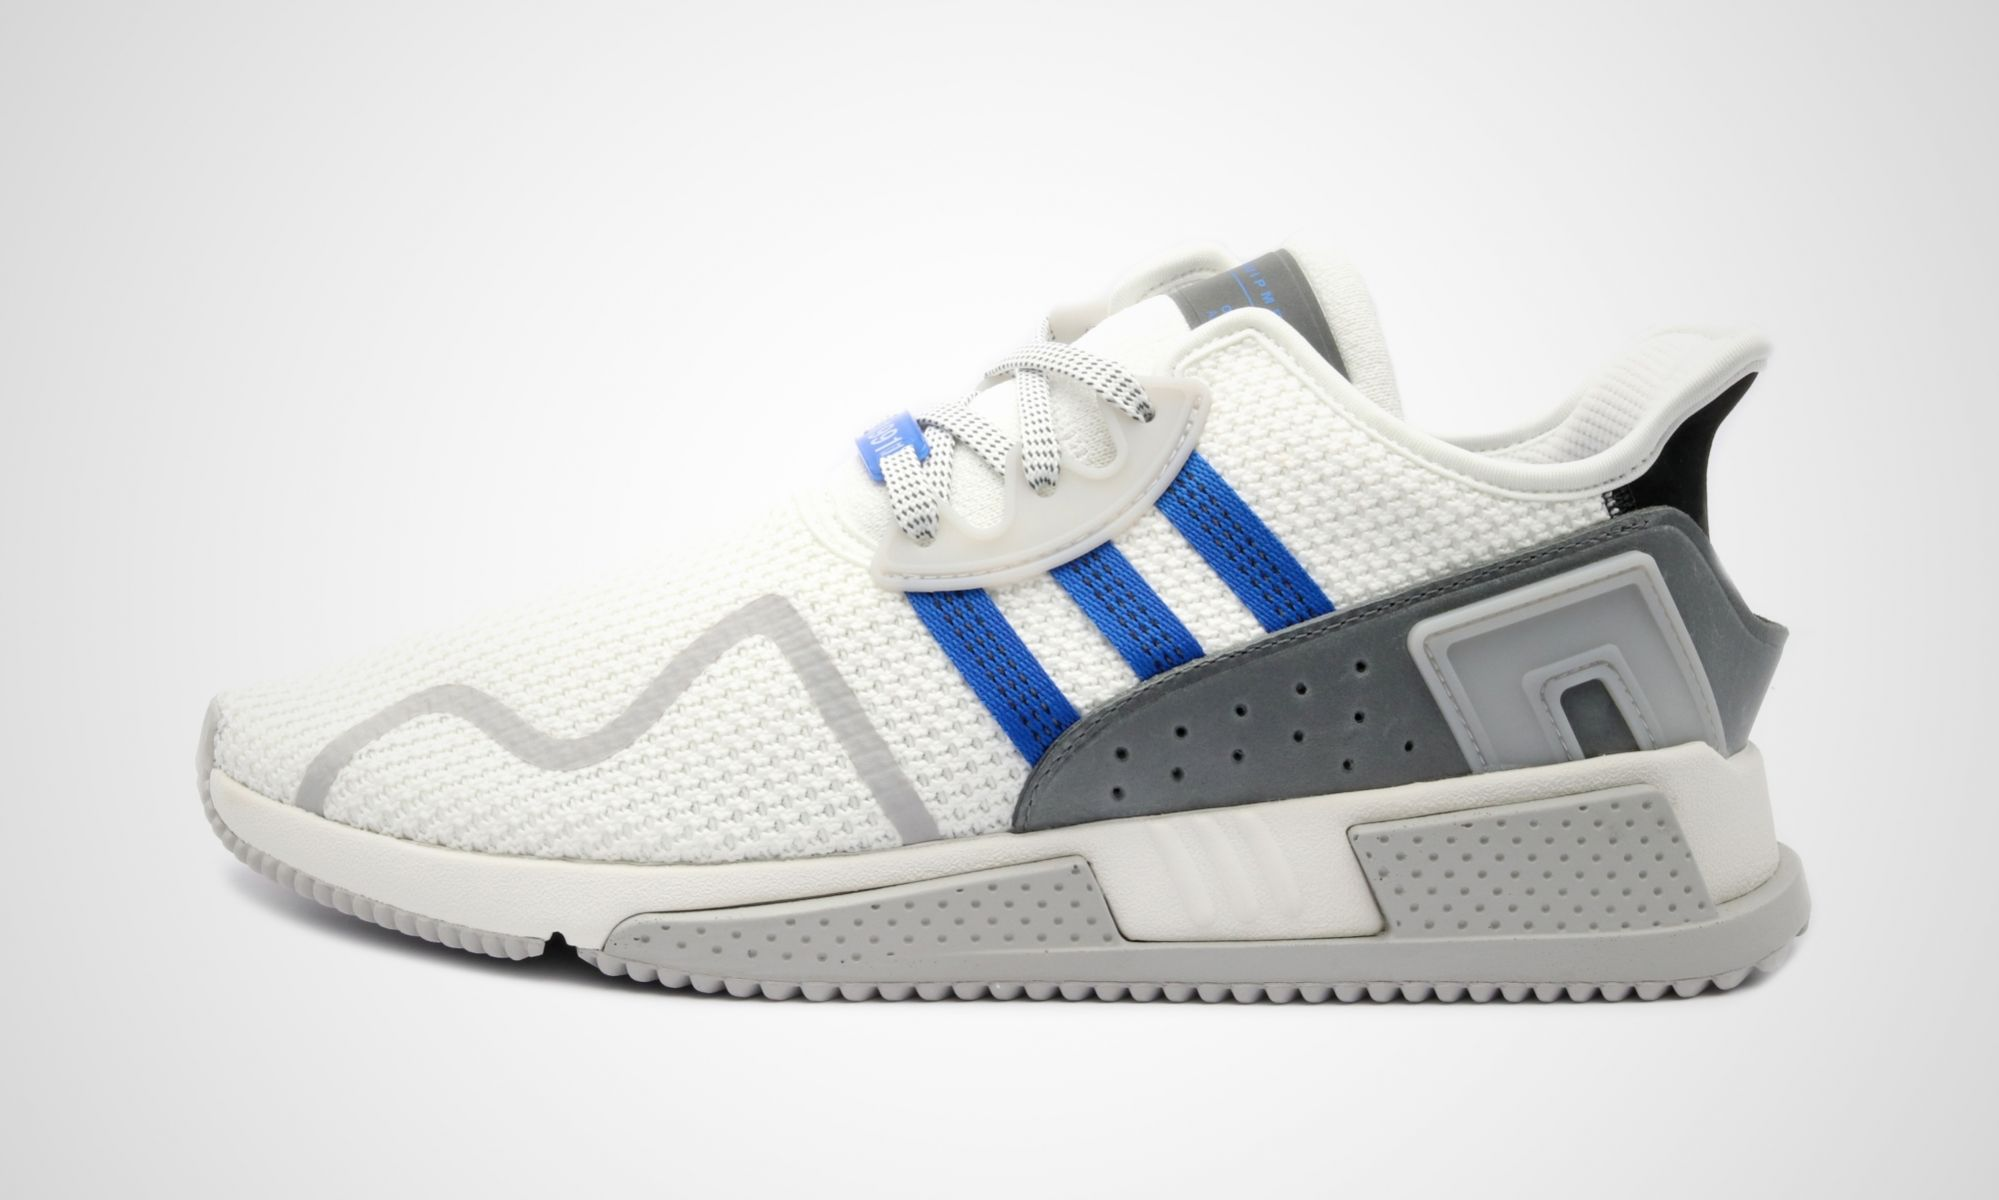 new styles 19cc4 a3039 adidas EQT Cushion ADV Europe  Dead Stock Sneakerblog